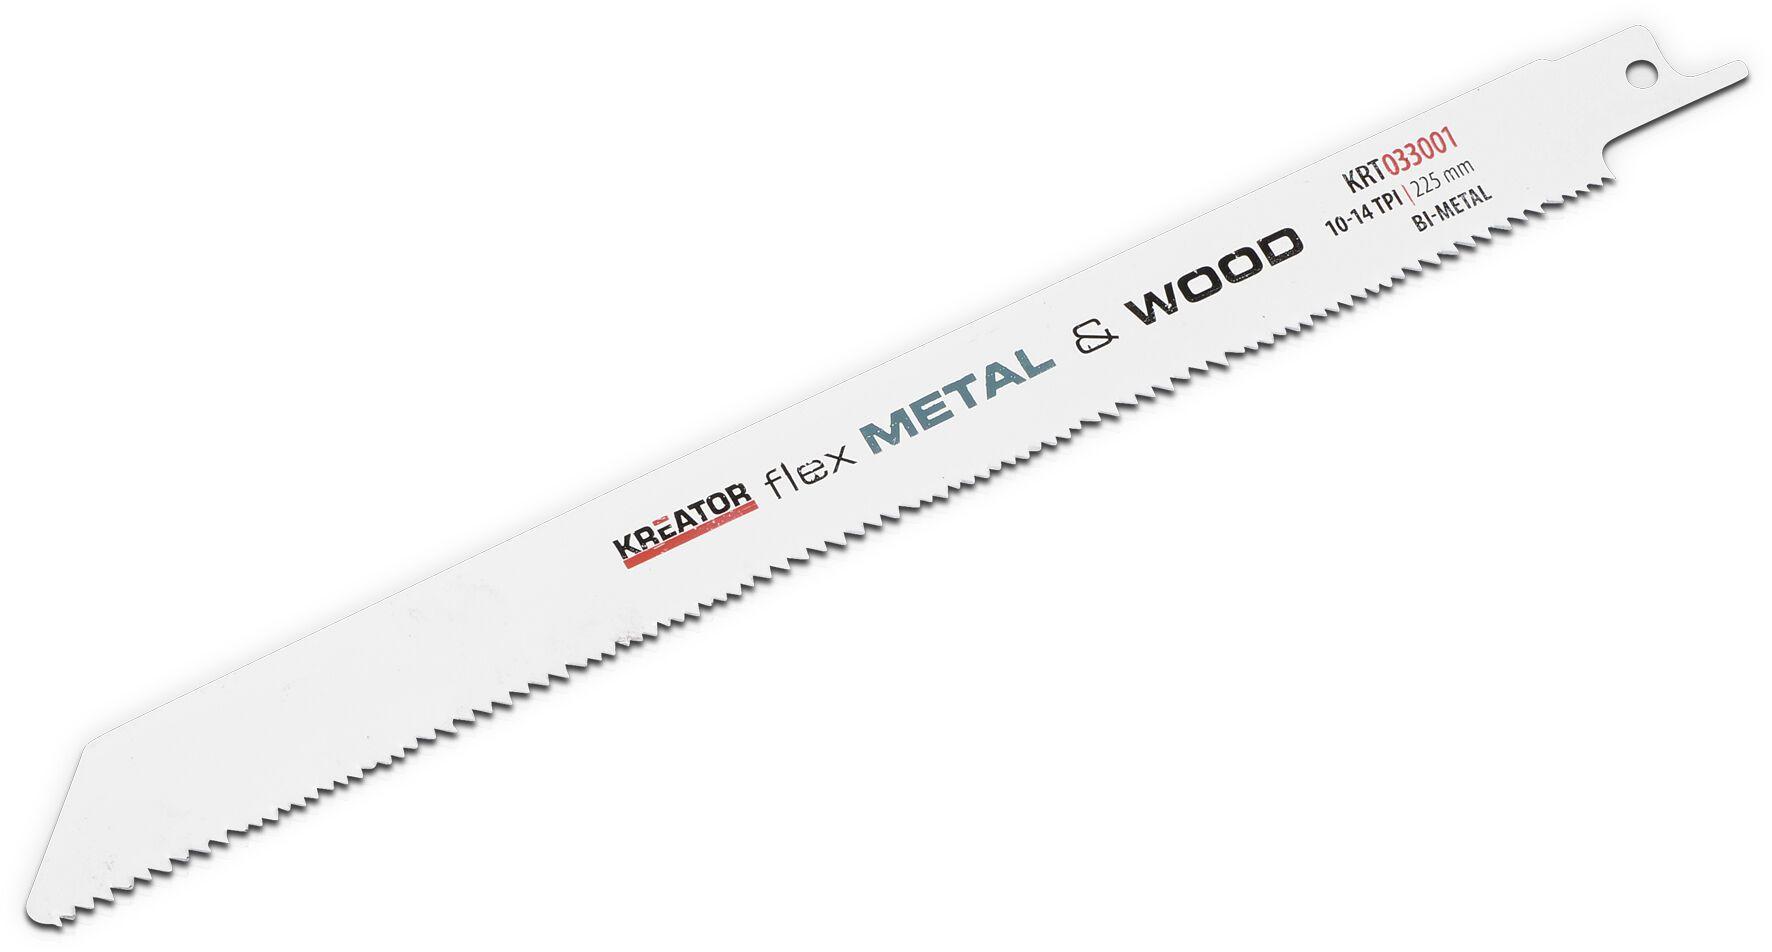 Kreator KRT033001 225mm Reciprozaagbladen   Zaagblad reciprozaag hout en metaal